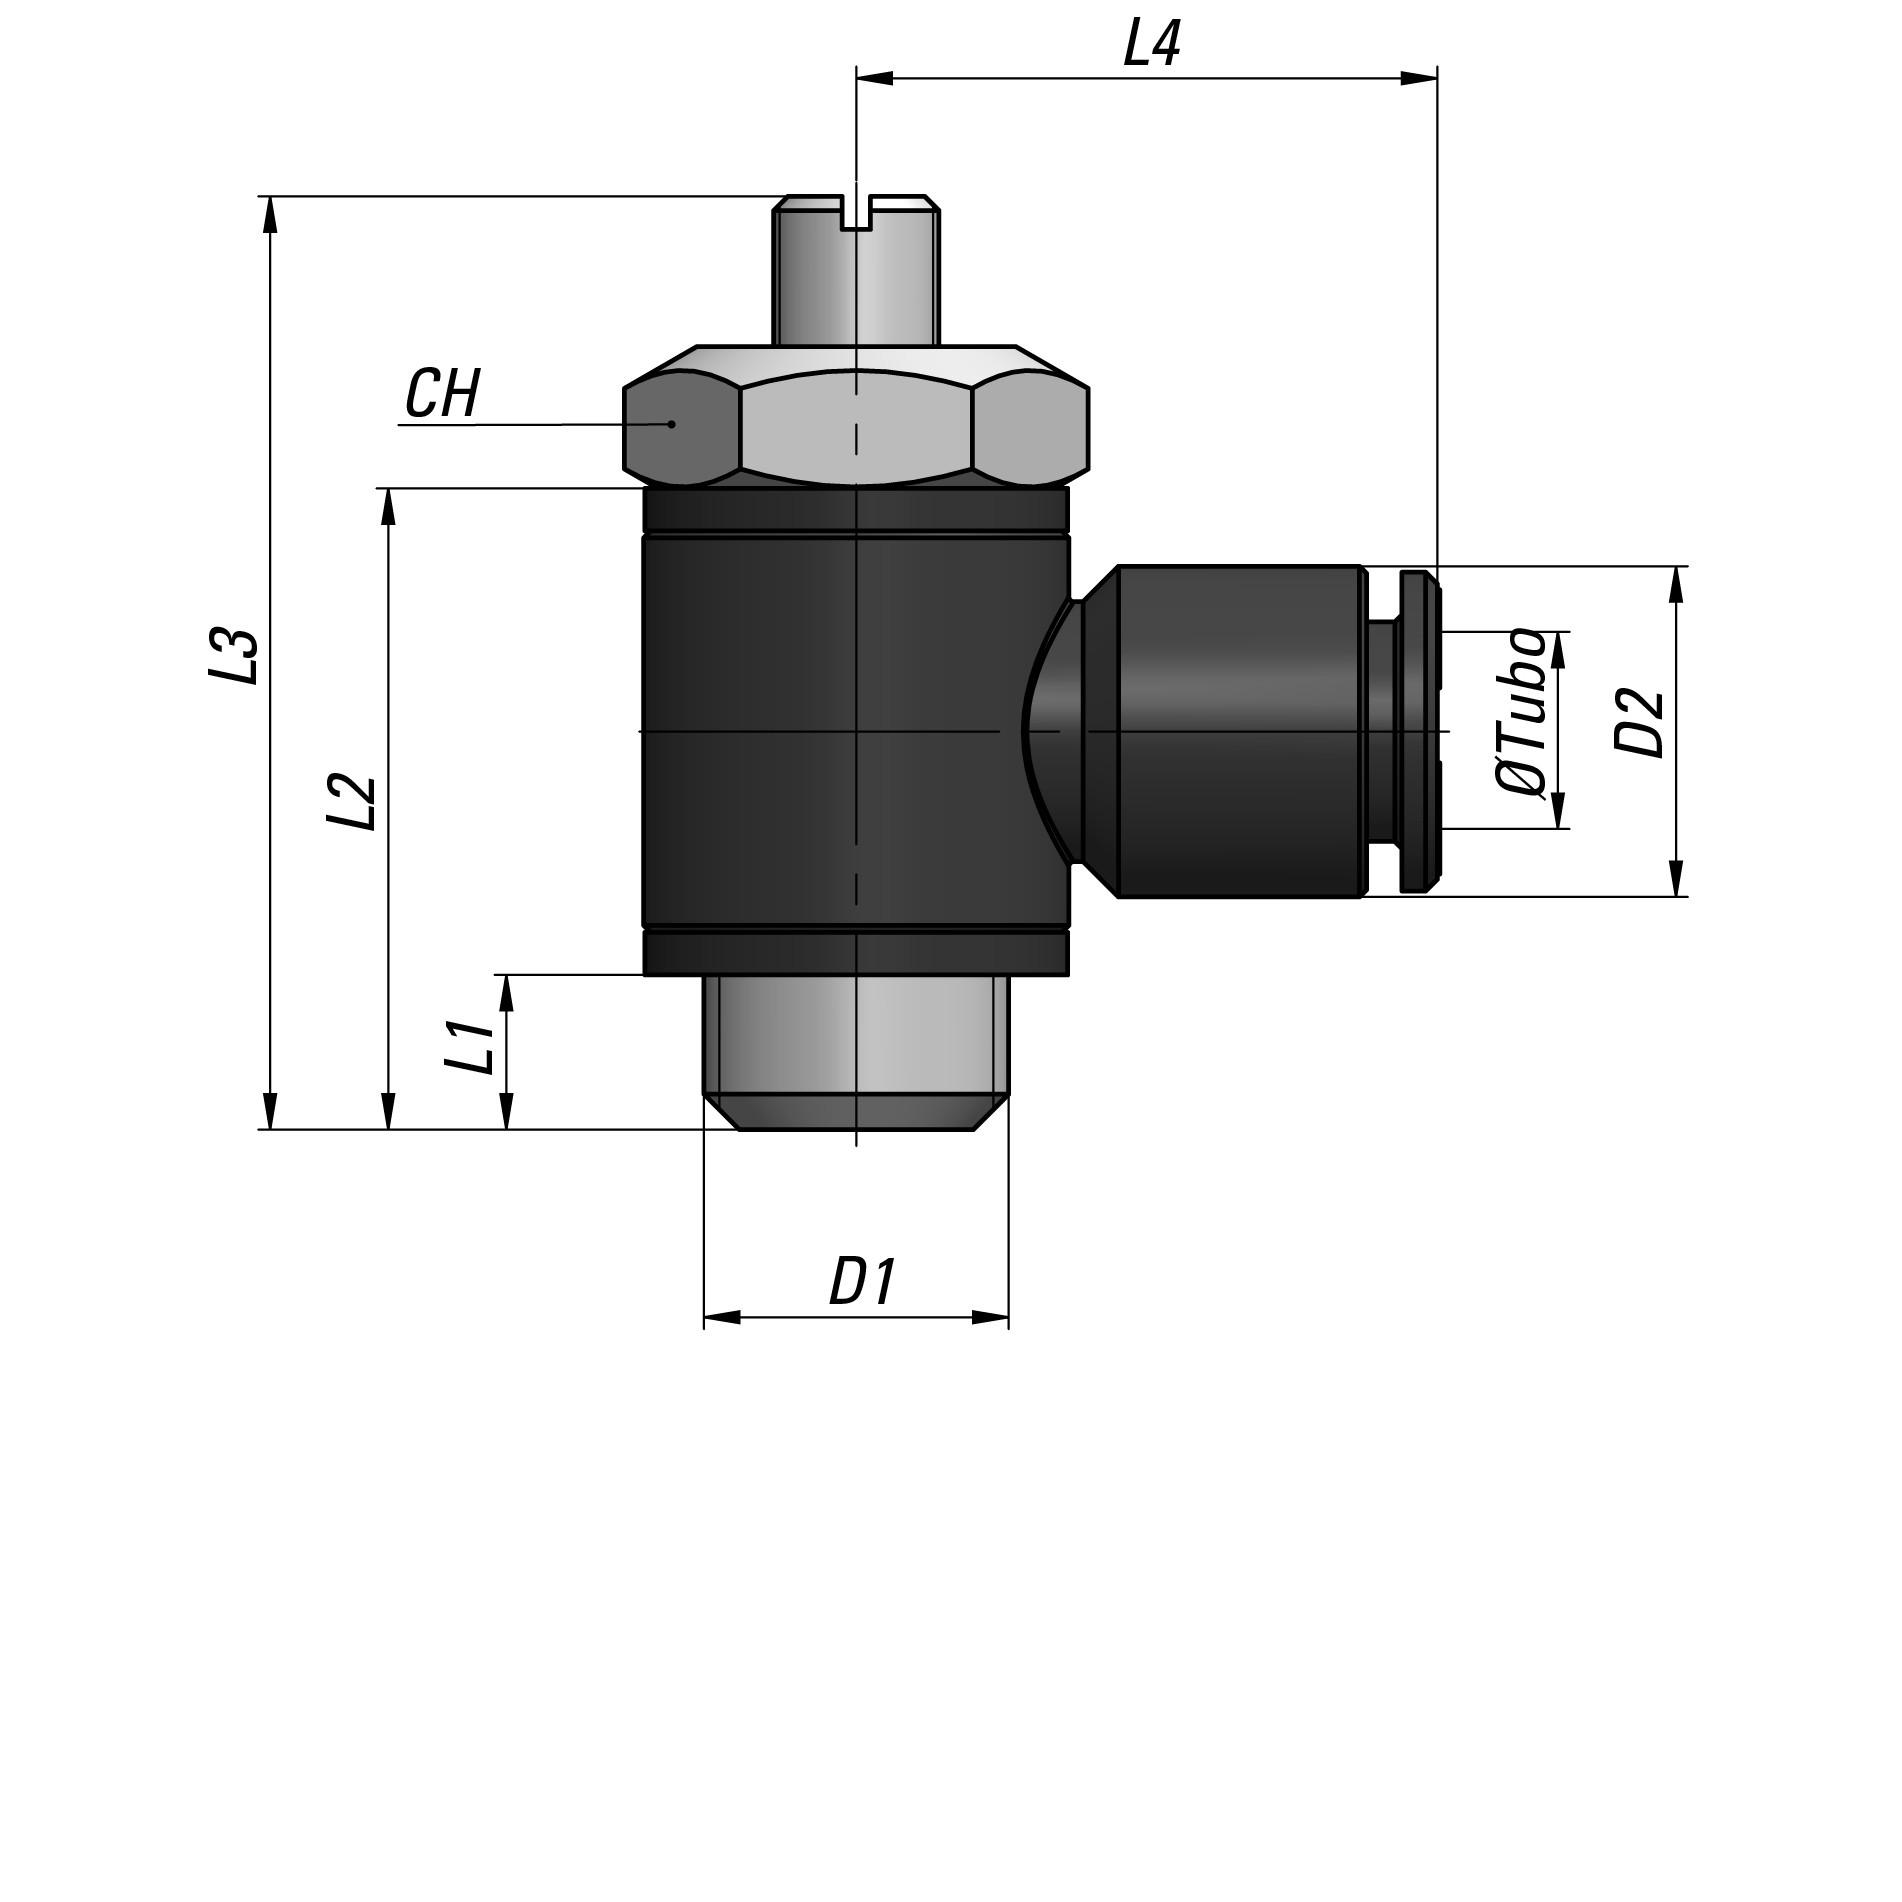 MV39 10 38 /V